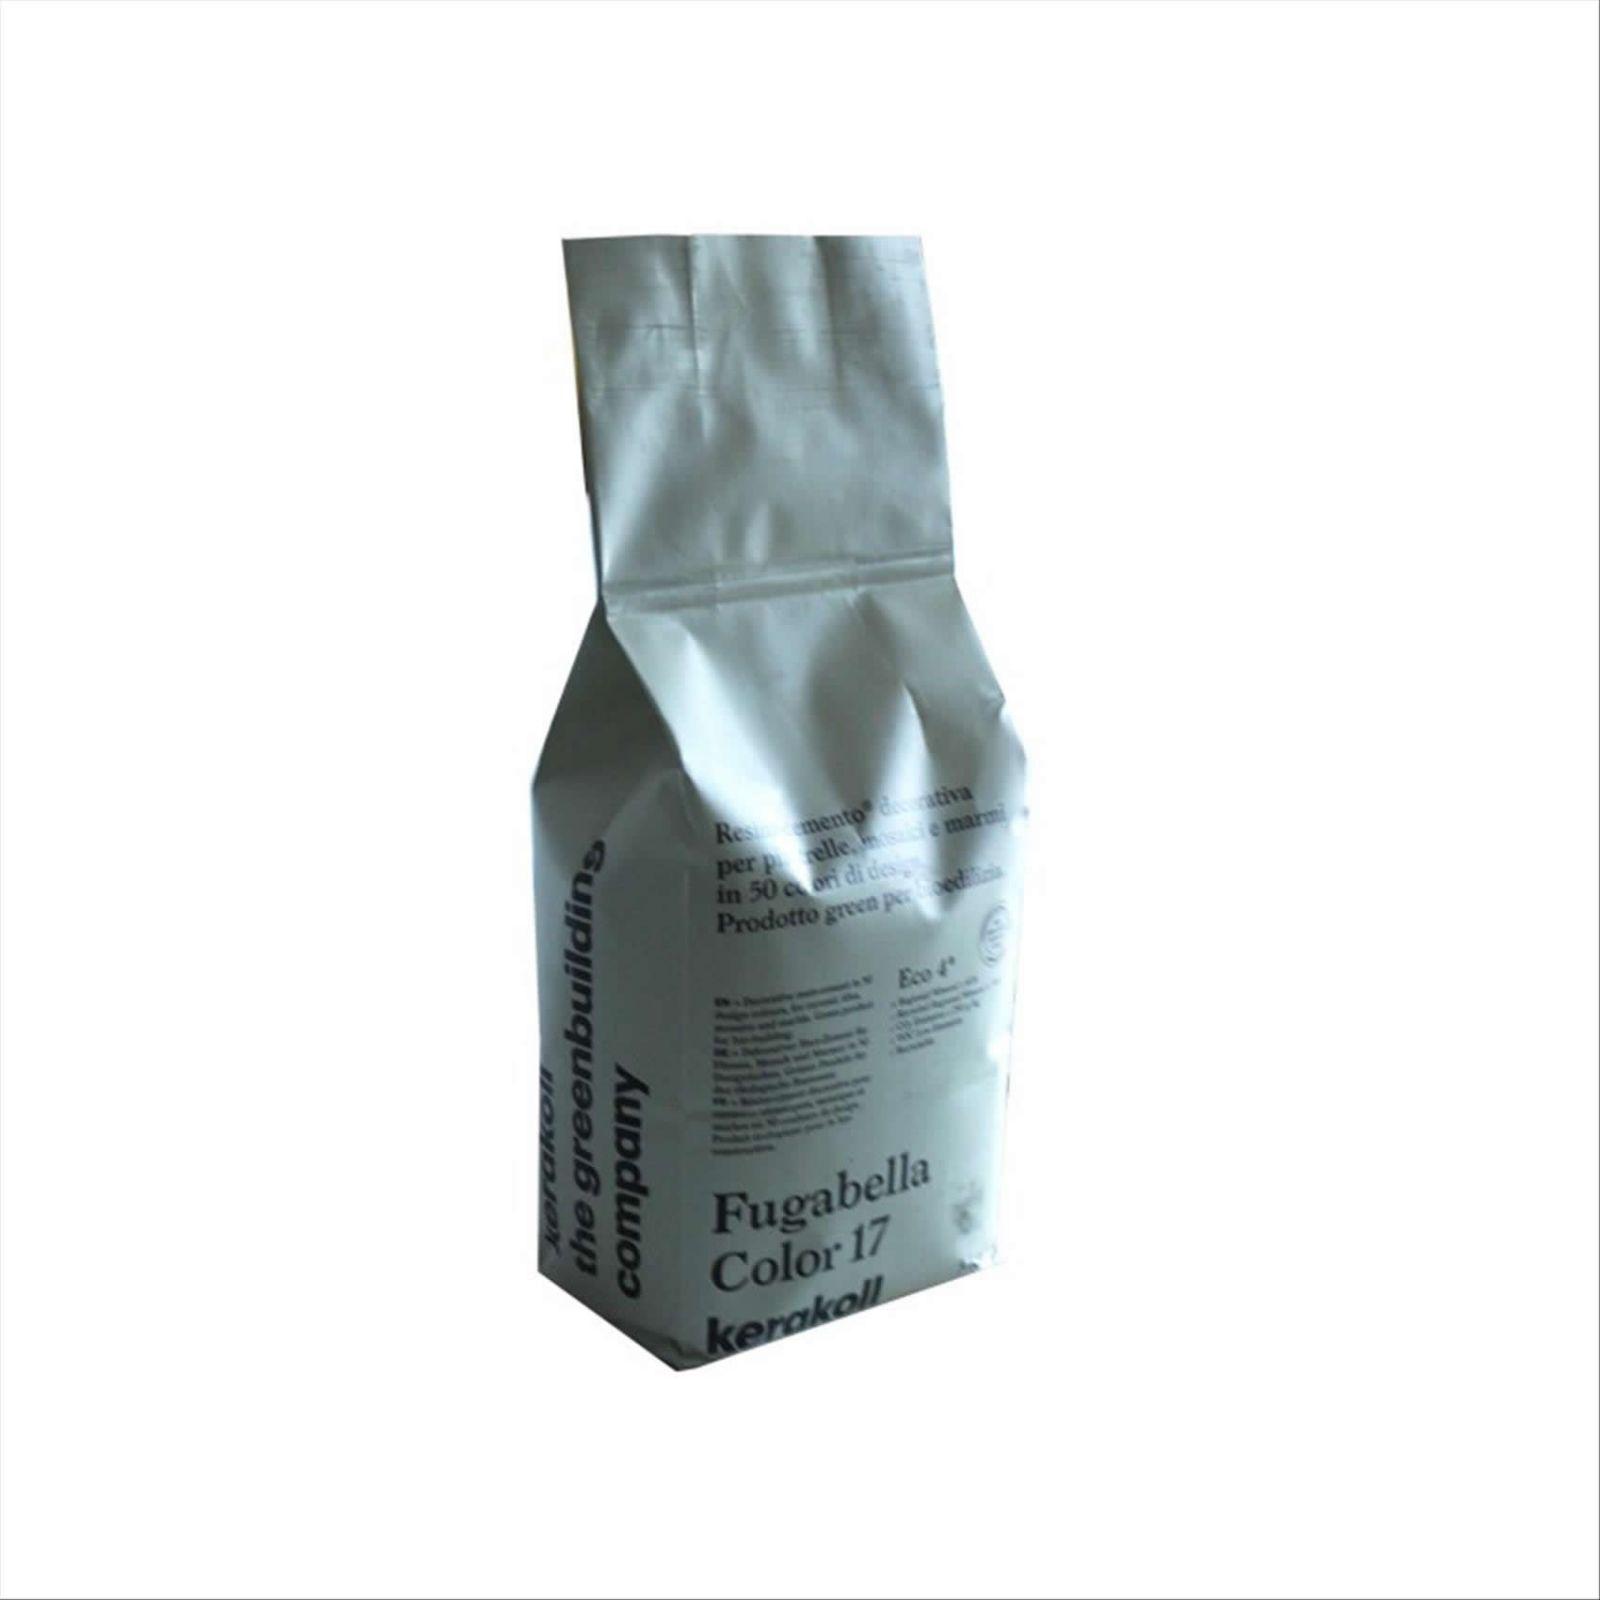 Fugabella Color 17 3kg